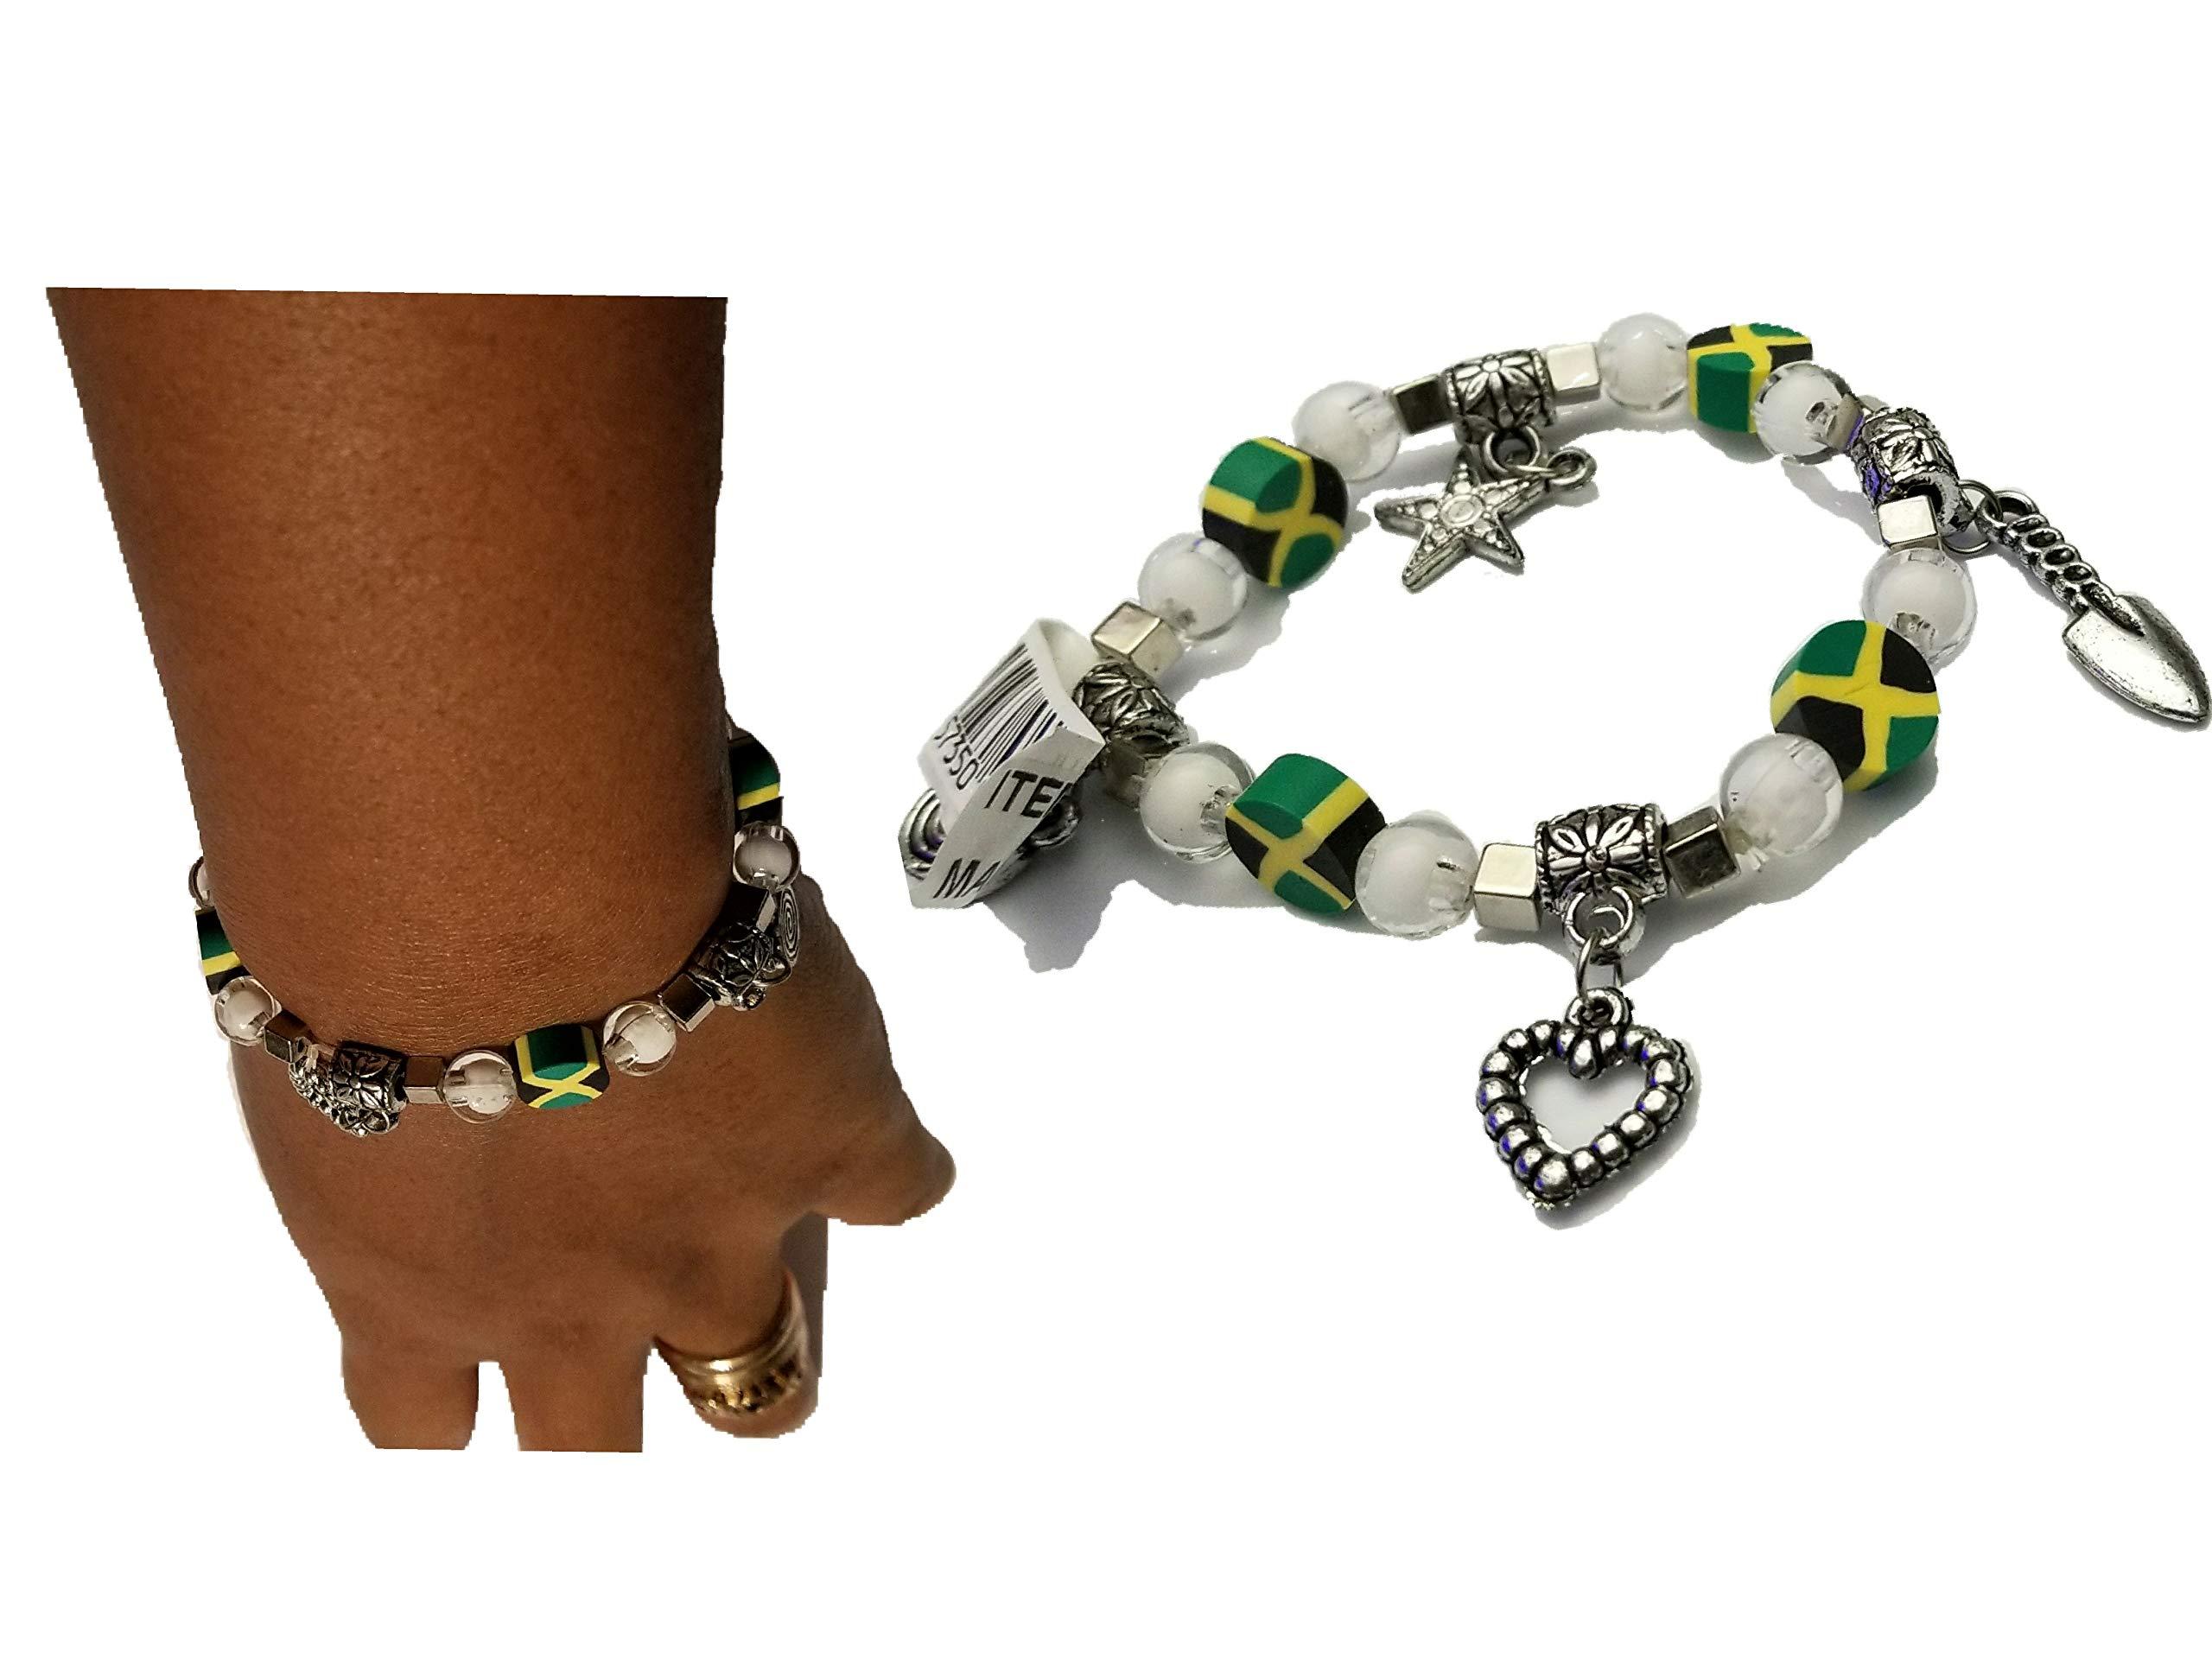 BUNFIREs Women Jamaica Jamaican Flag Bracelets Jewelry (Bracelet Charm) by BUNFIREs (Image #2)